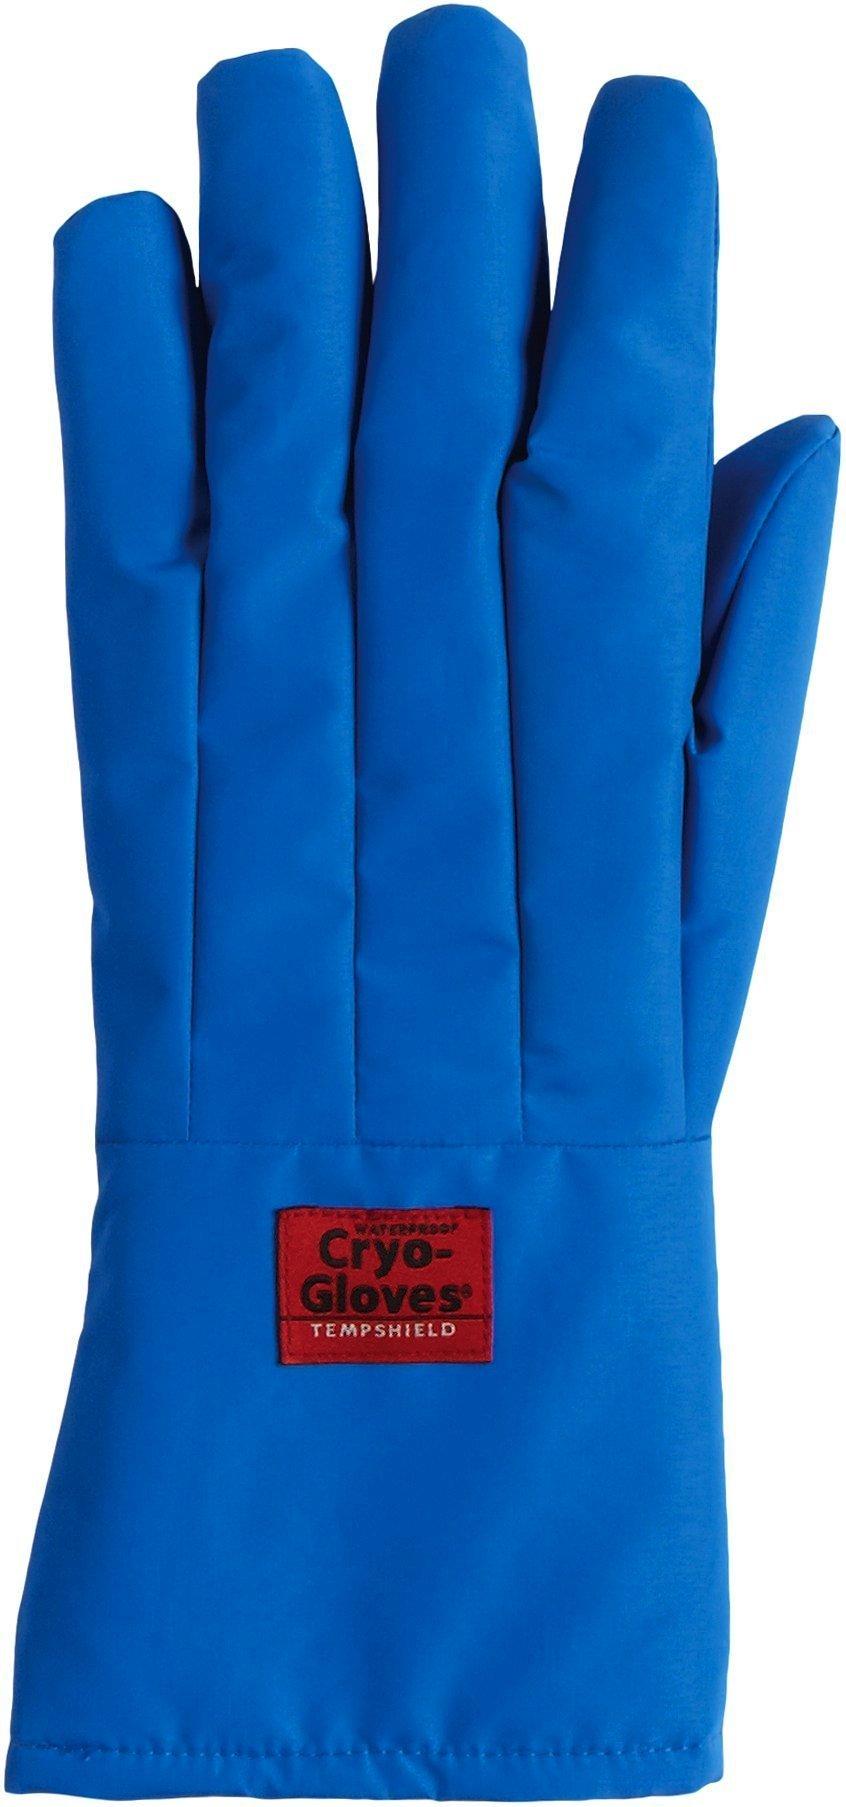 Tempshield MAXLWP Cryo-Glove, Mid-Arm Length, Waterproof, X-Large